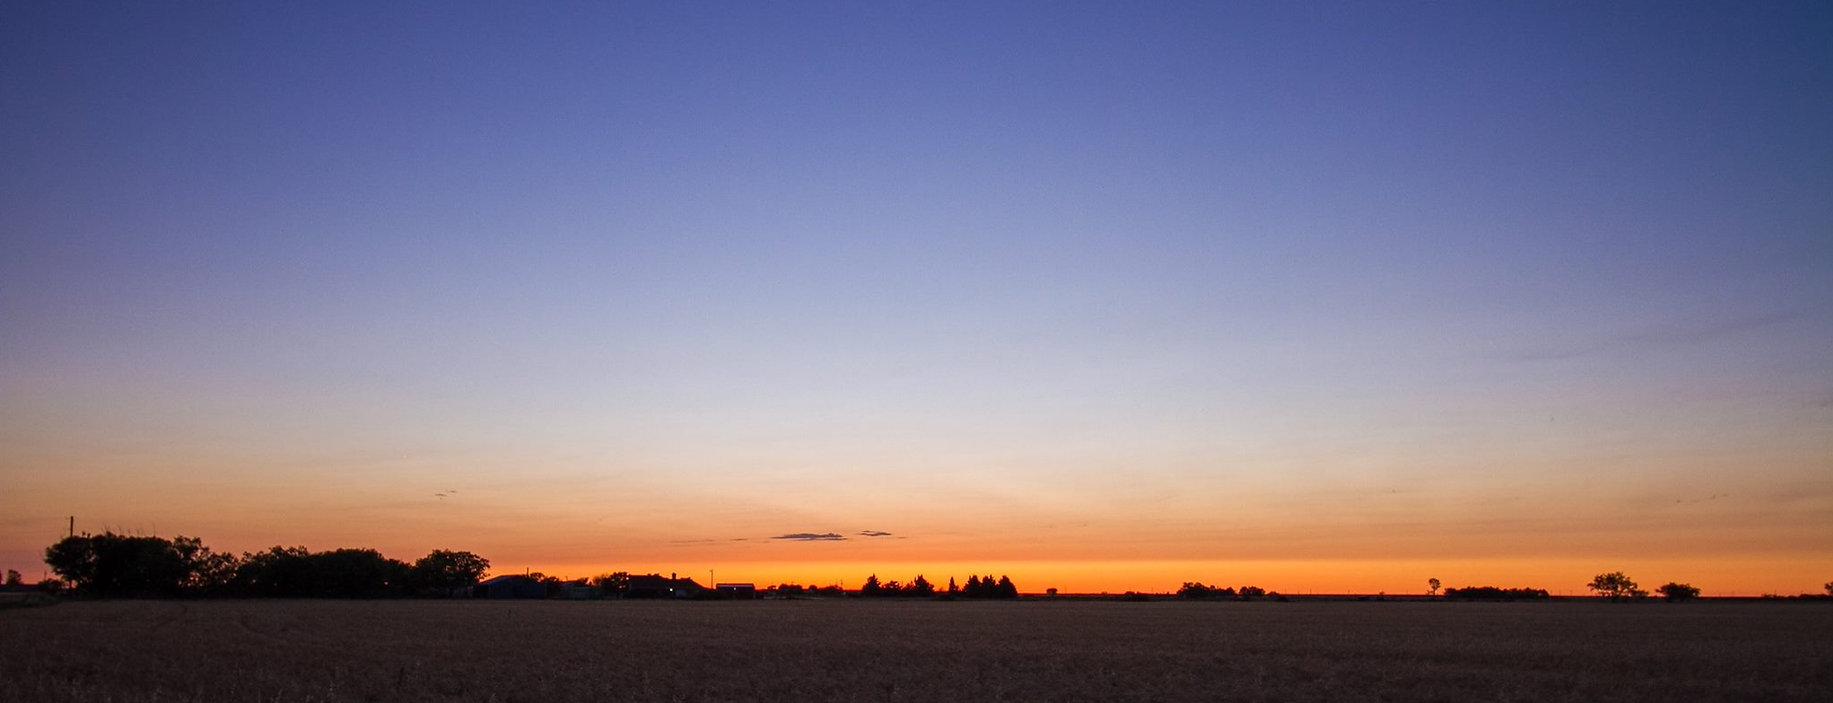 Sunset over Abilene, Texas Landscape Photography